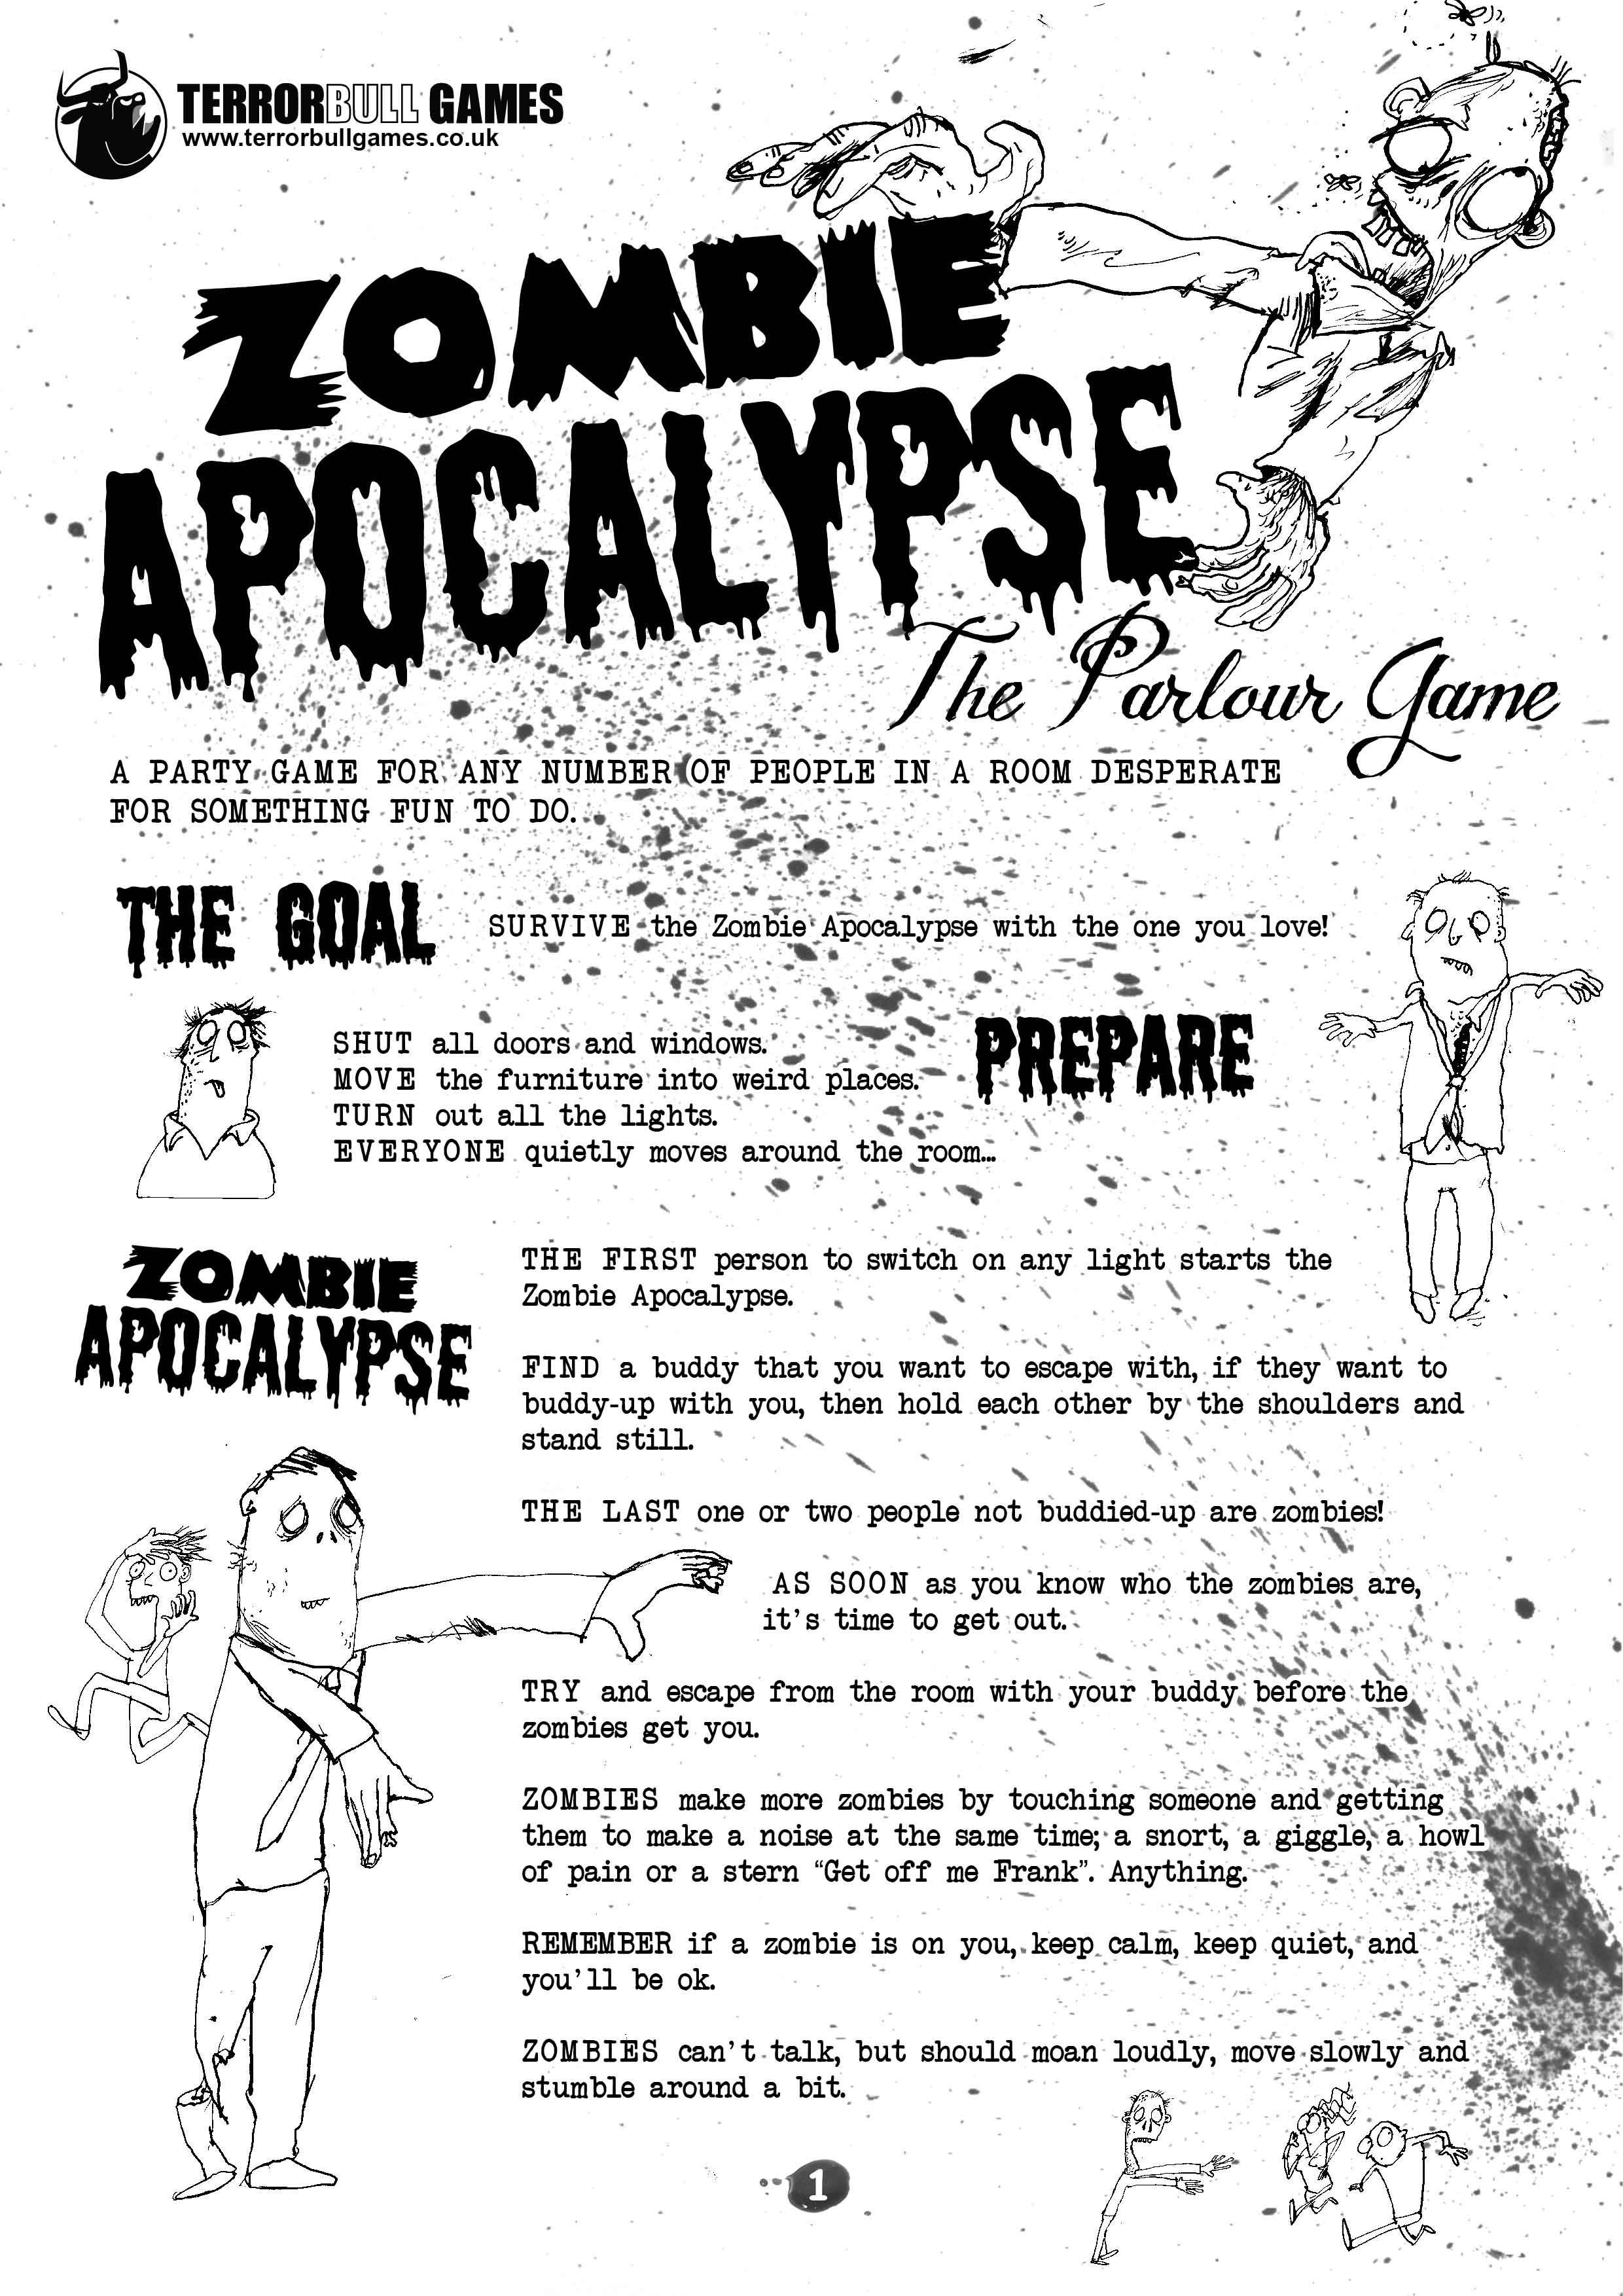 Zombie Apocalypse The Parlour Game